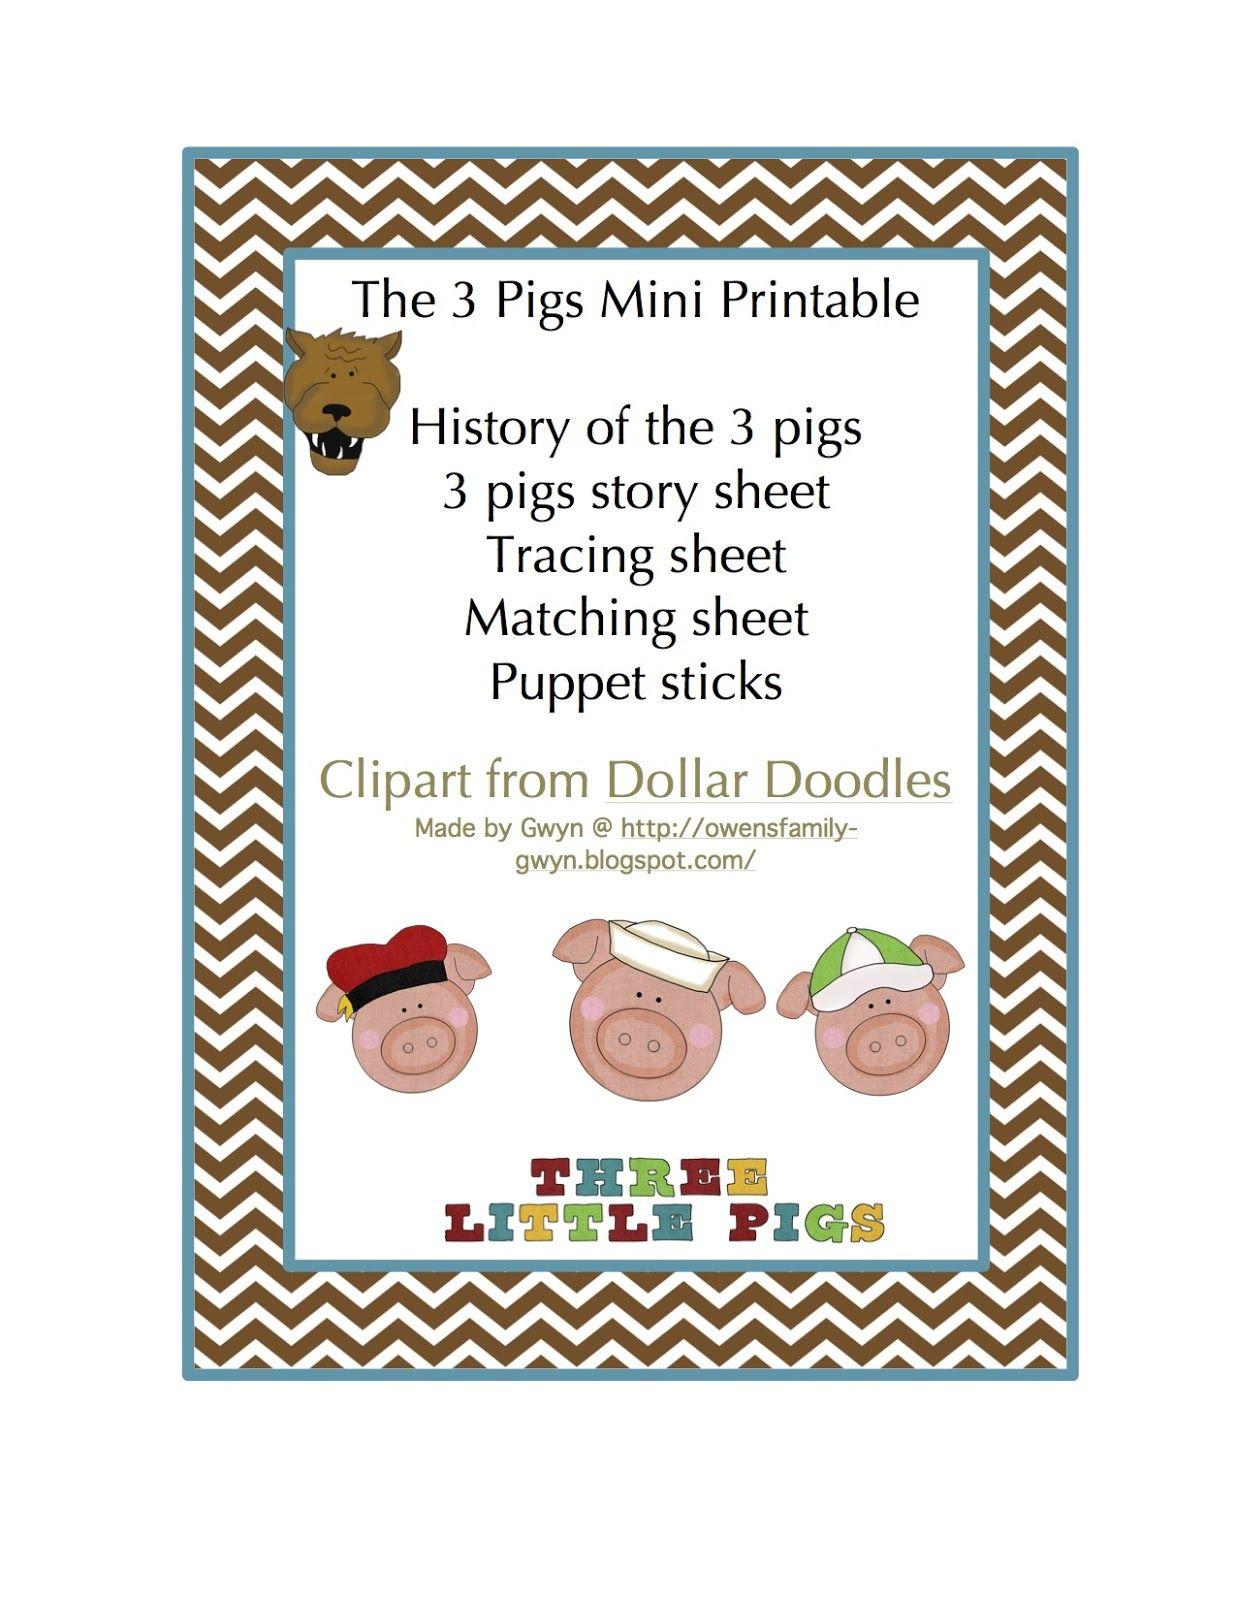 Preschool Printables The 3 Pigs Mini Printable